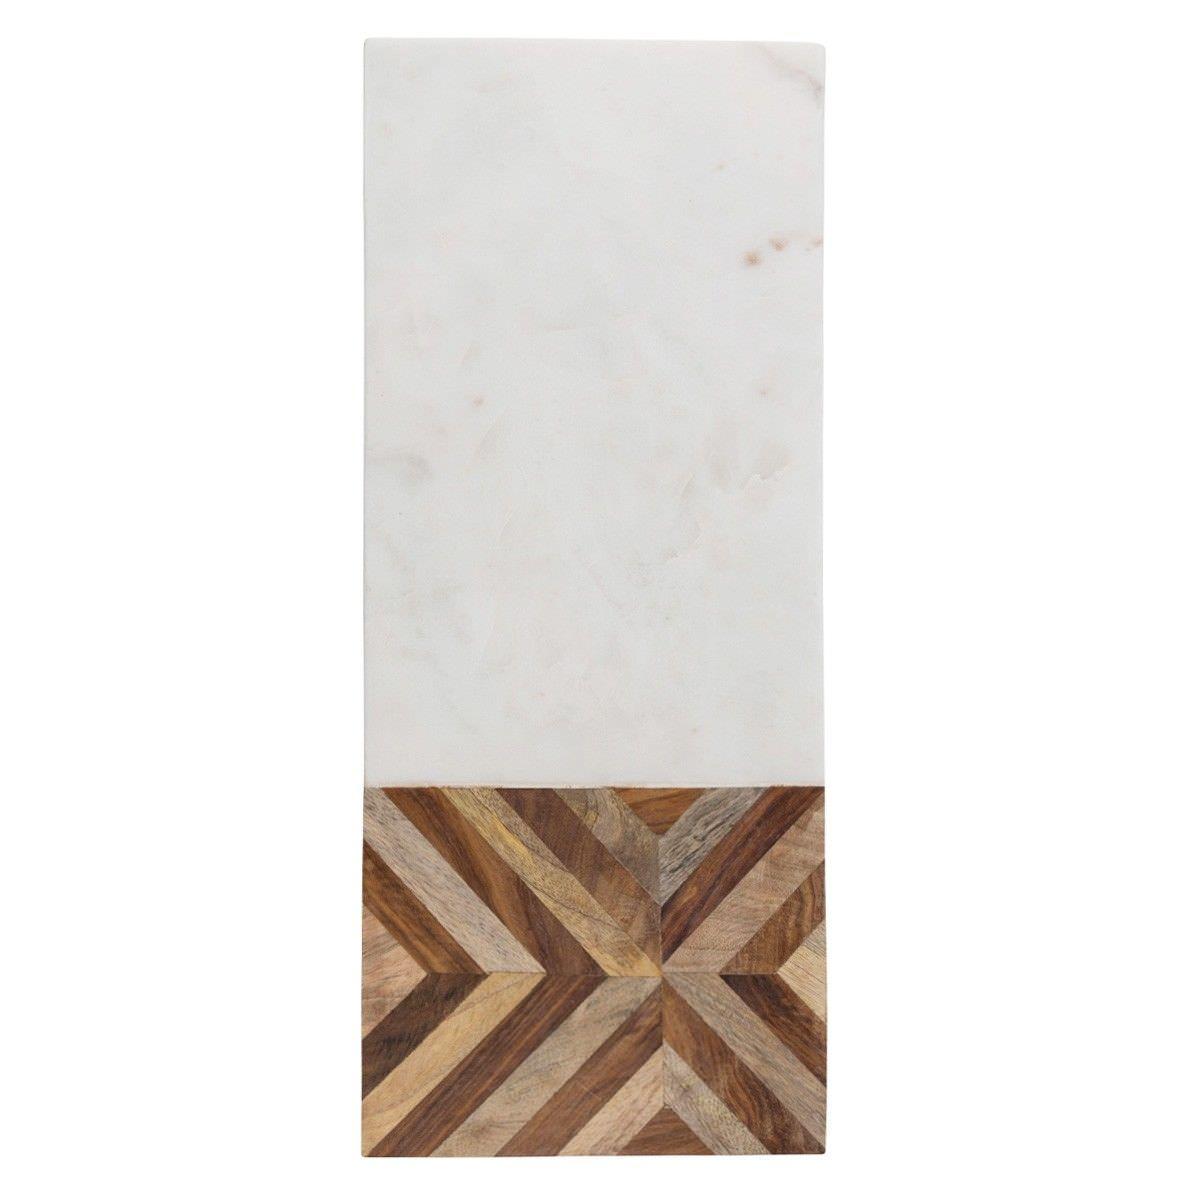 Alma Marble & Timber Rectangular Serving Board